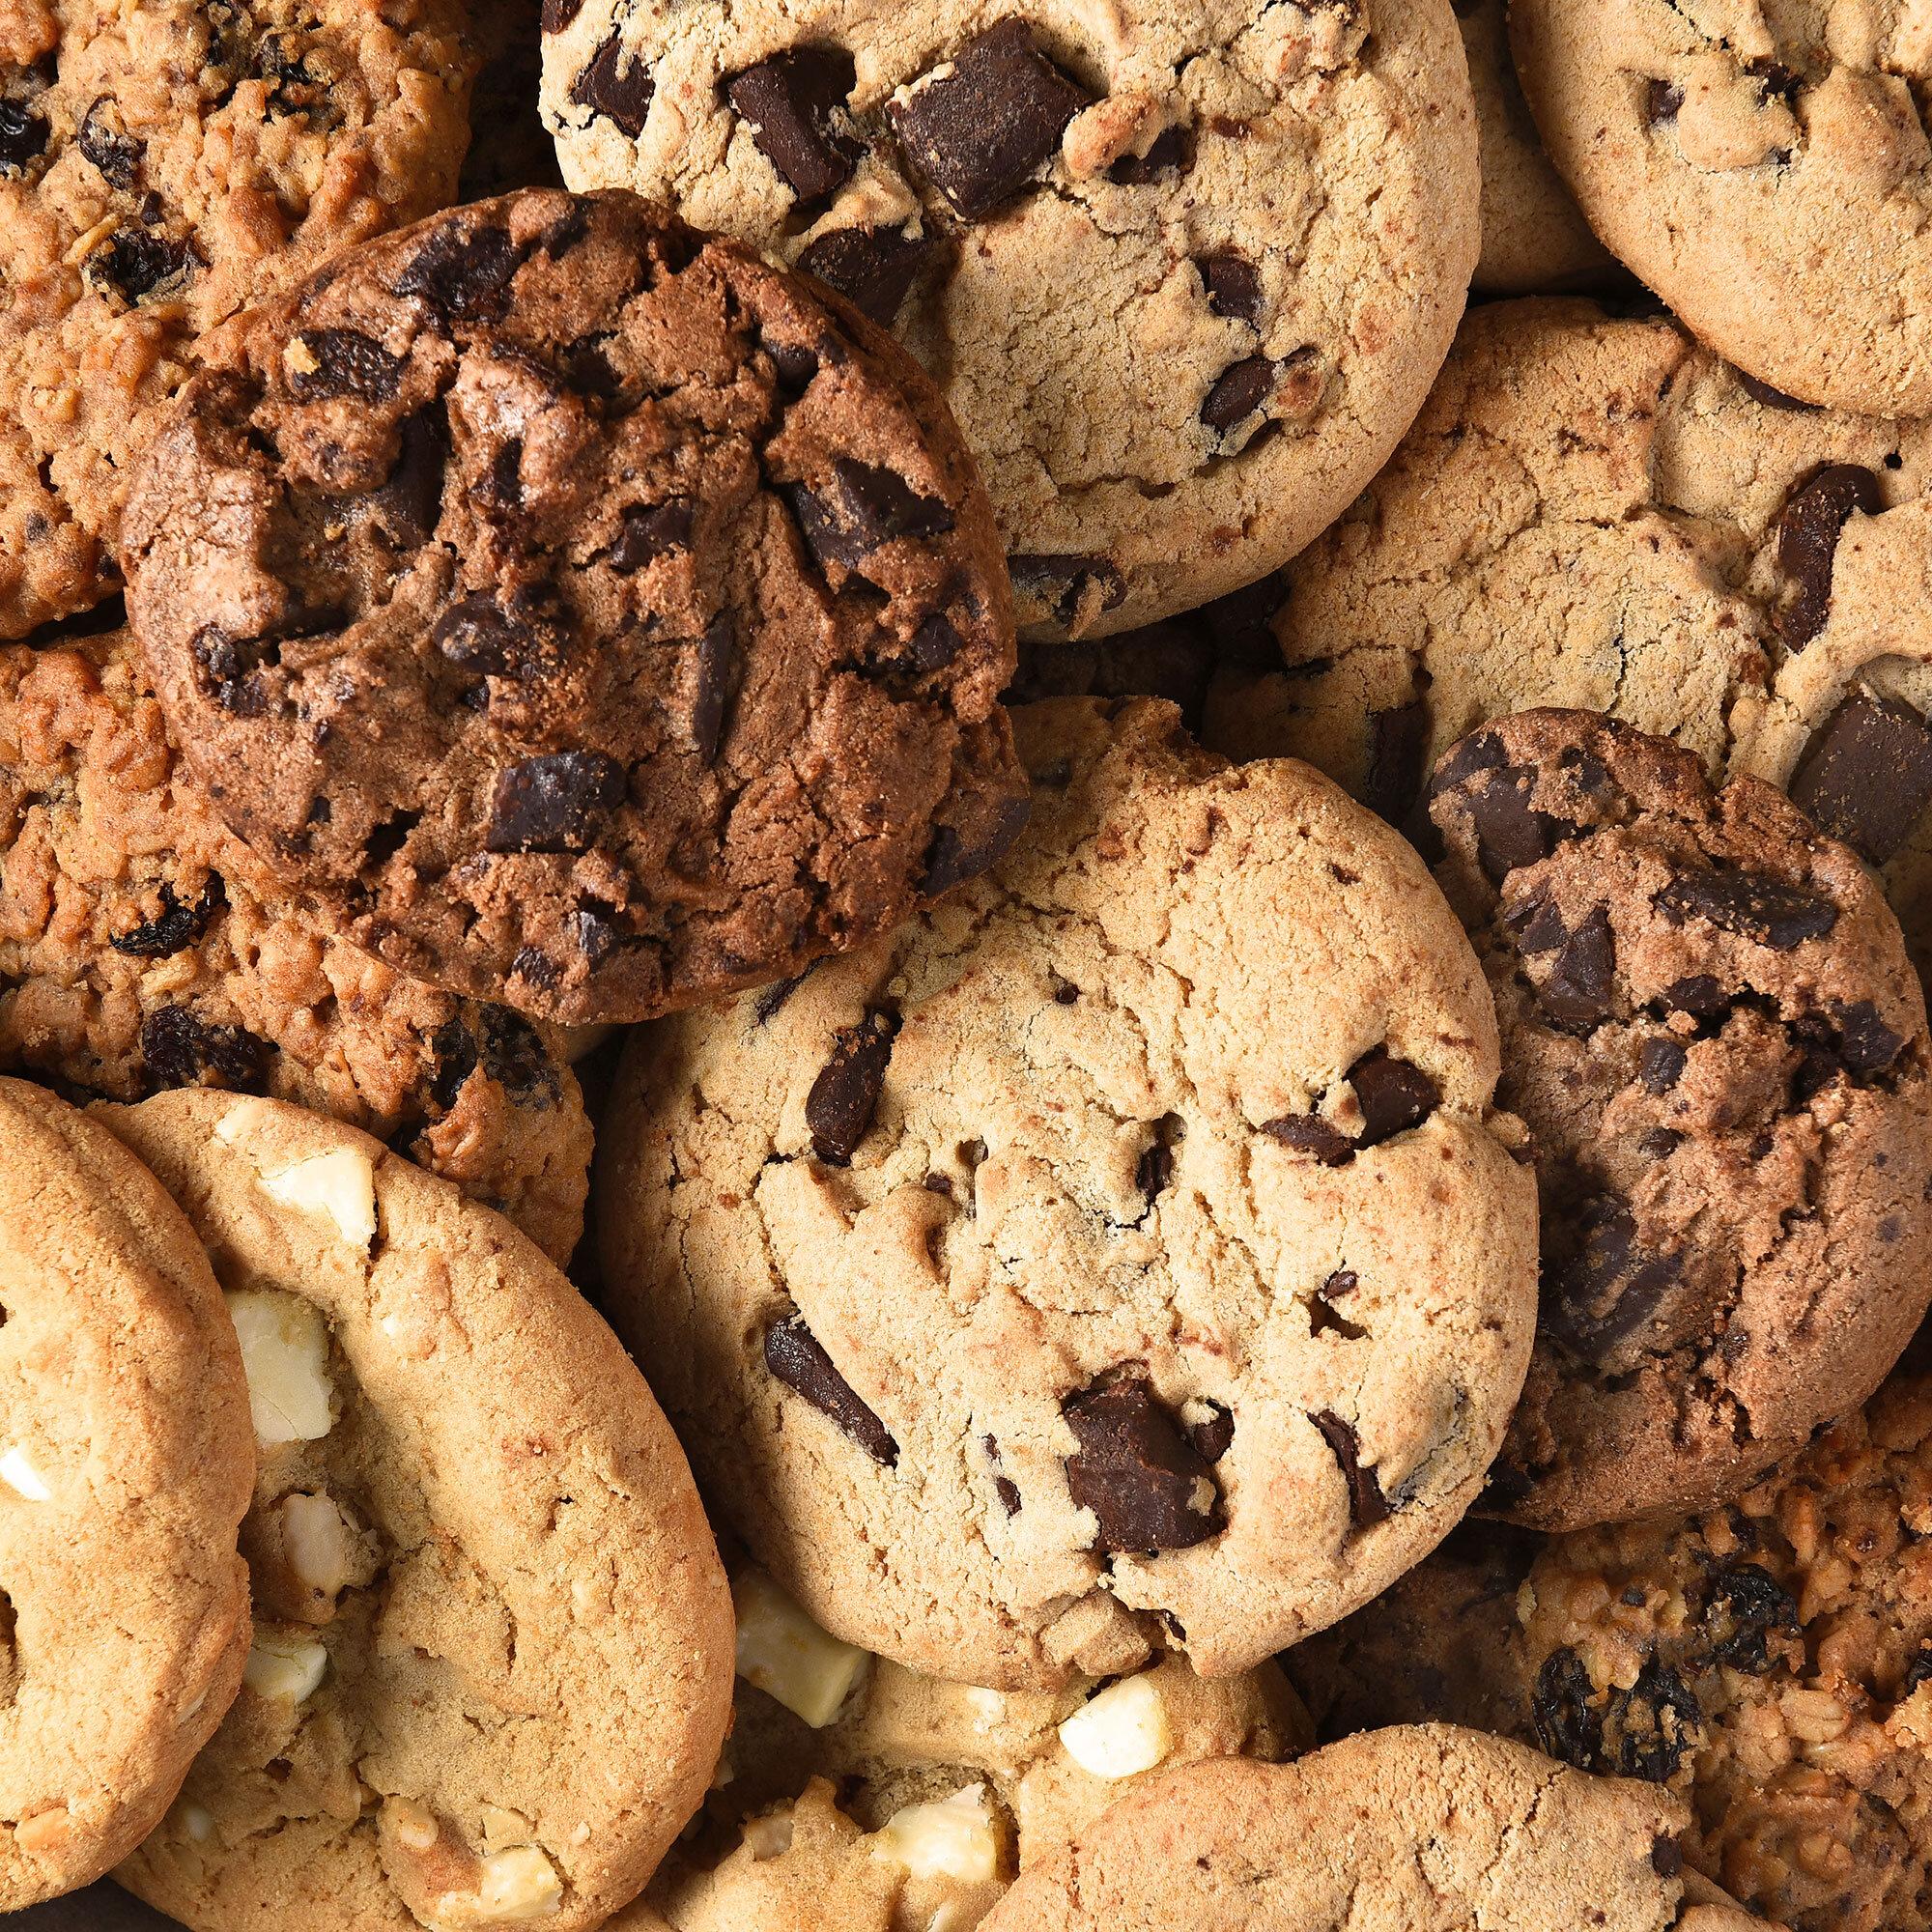 https://www.hybrisonline.com/pub_docs/files/Cookies/CookiesShirtstore.jpg